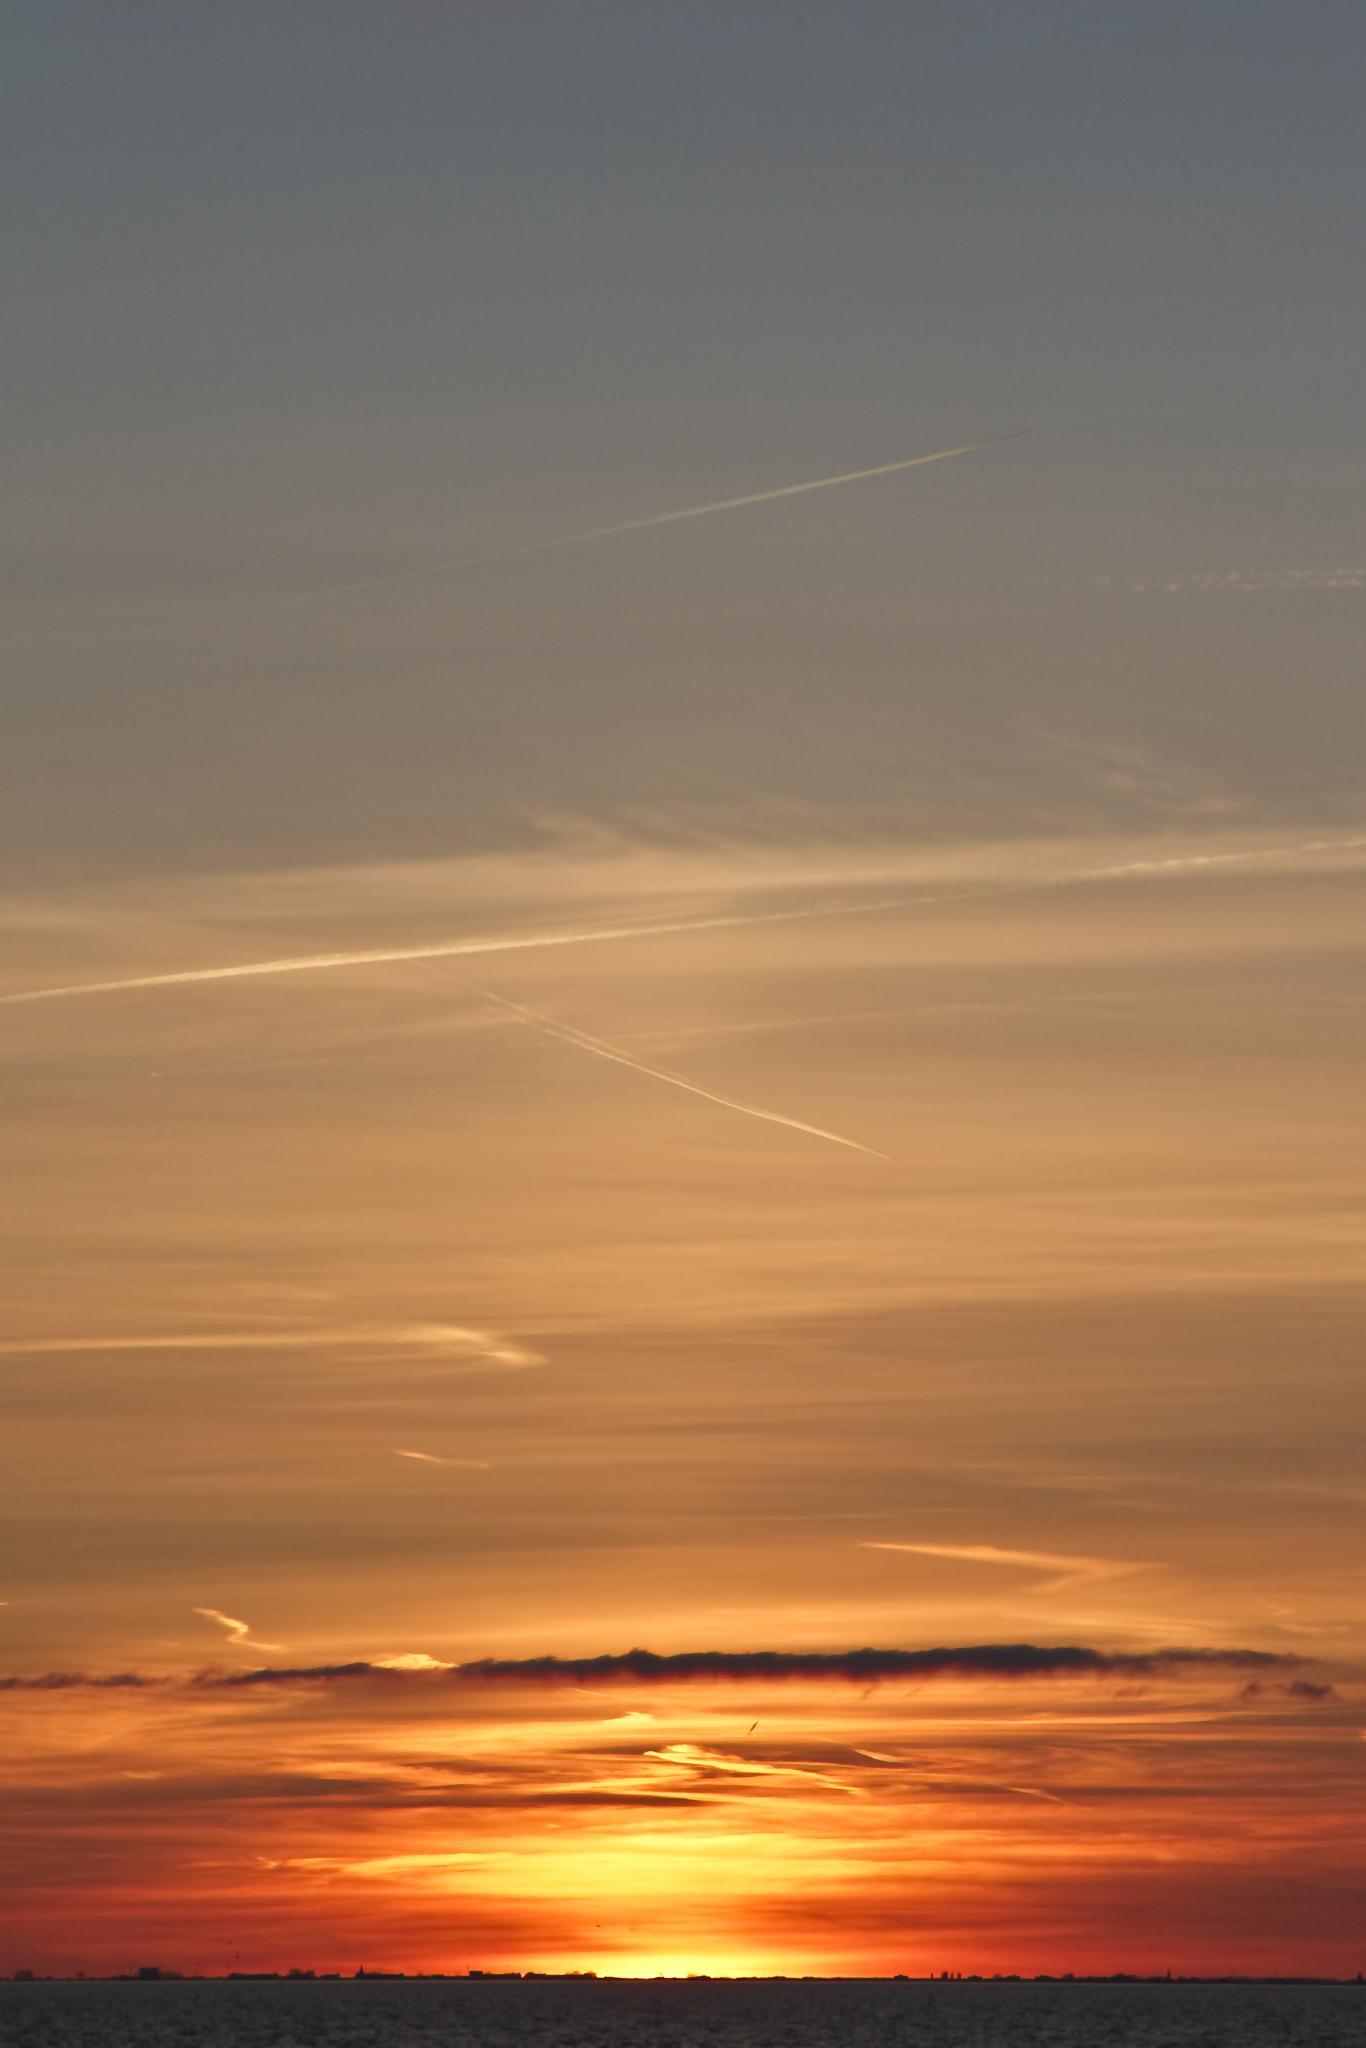 Sunset over Amsterdam from Almere by danielle.klaveroverdijk